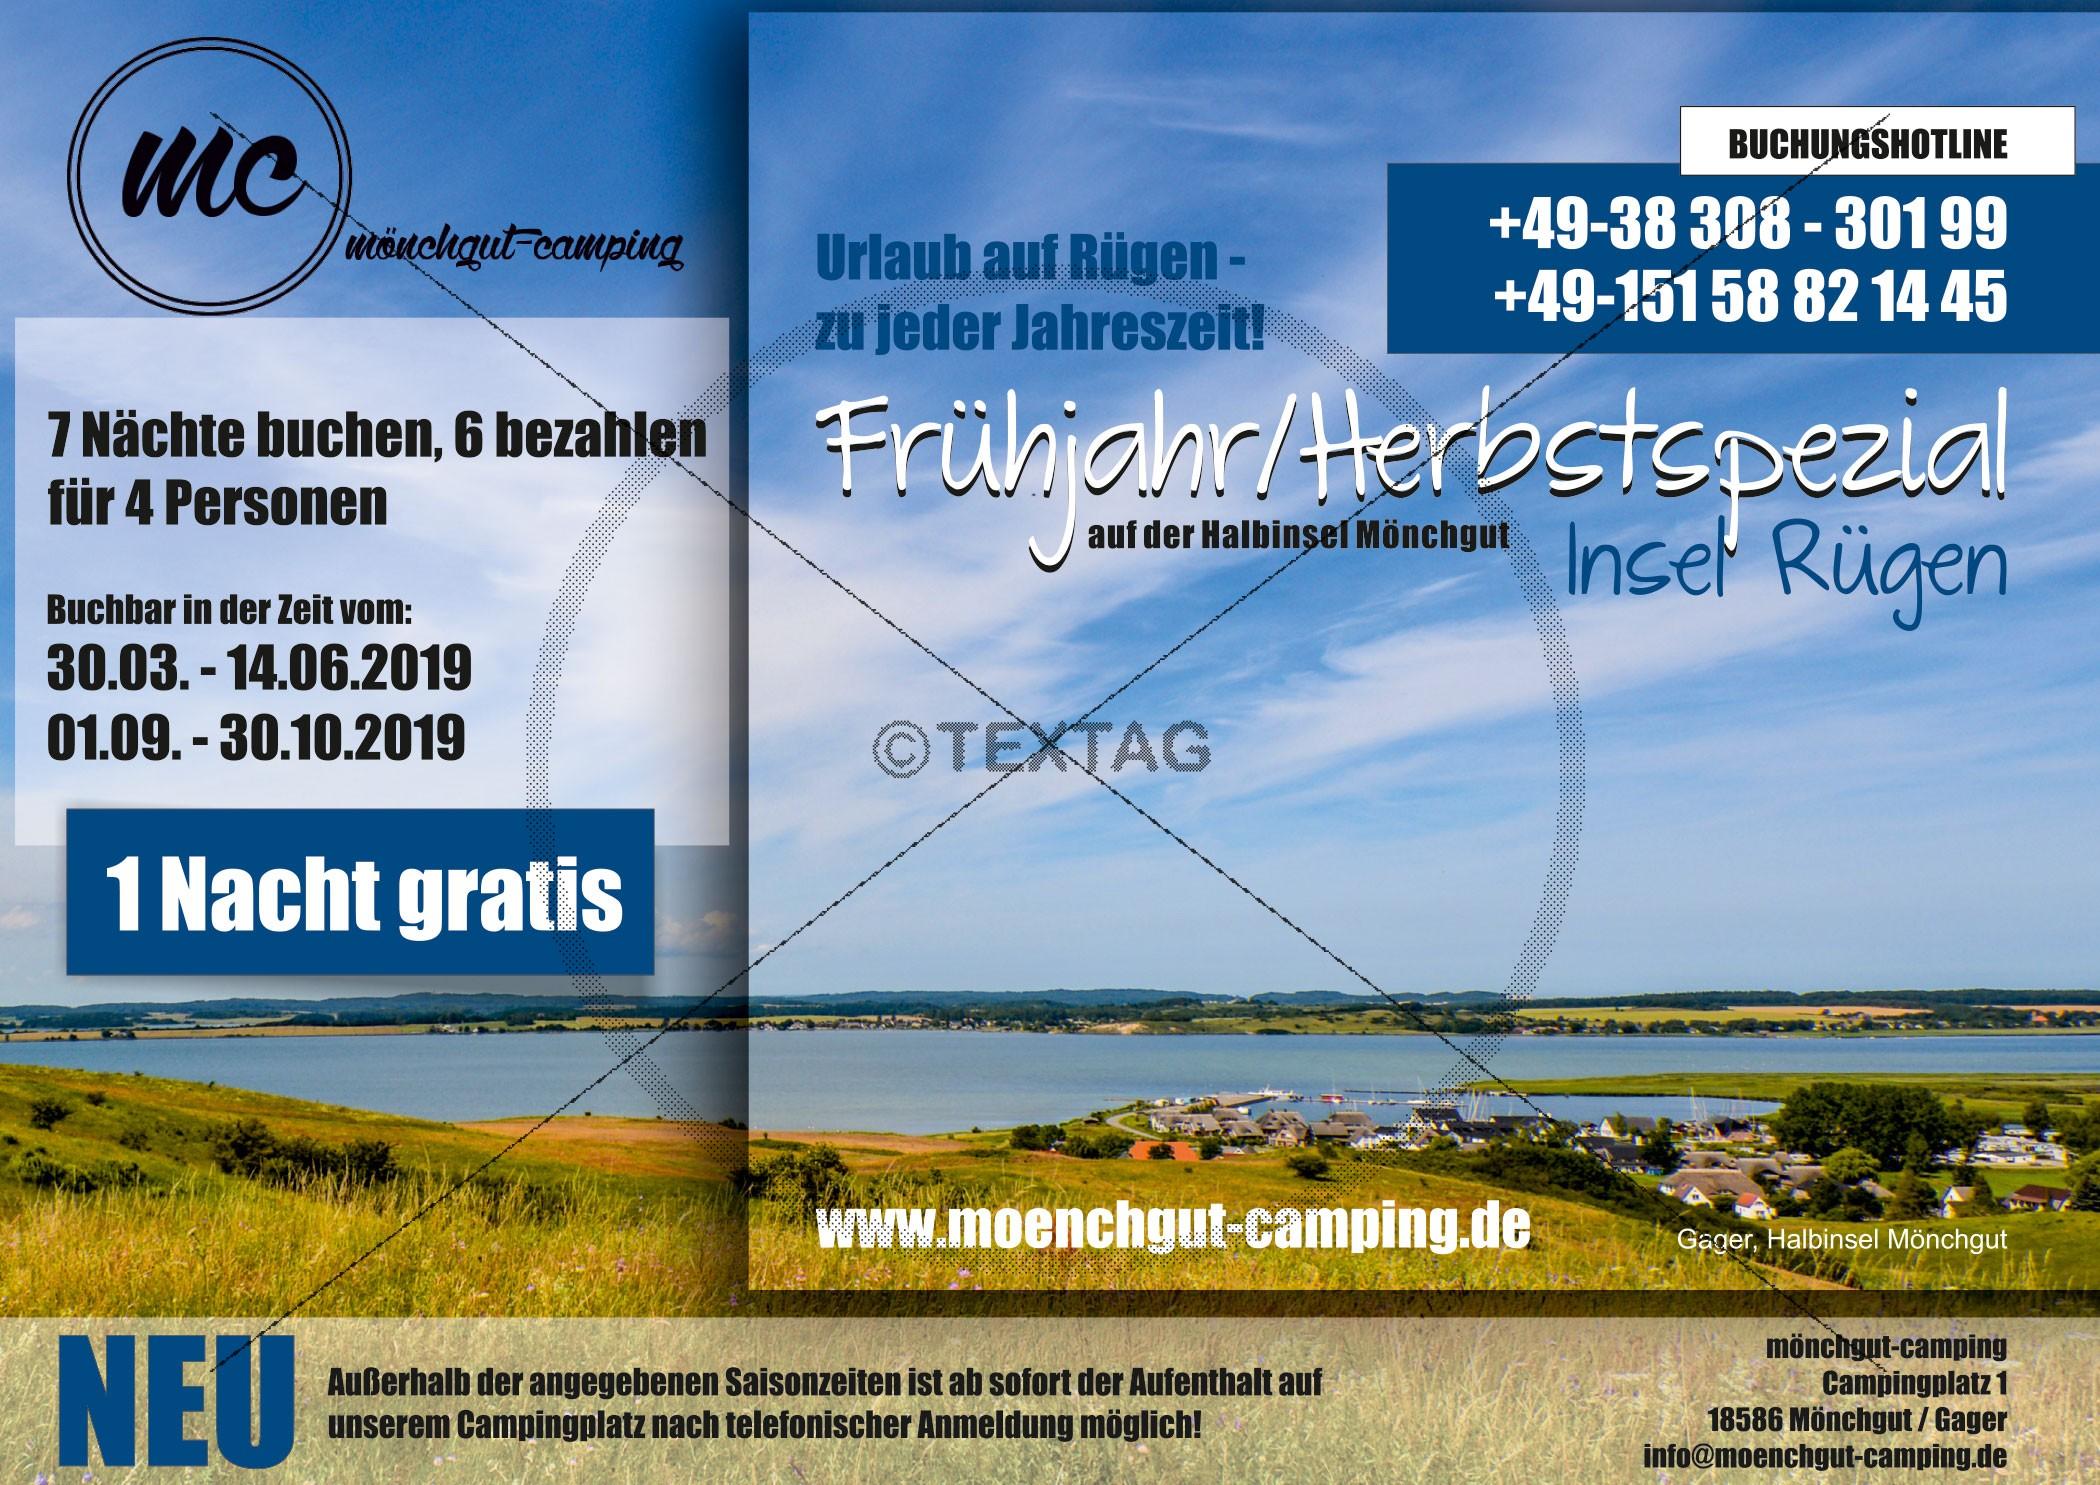 Grafik & Design Referenzen: Onlinewerbung - Mönchgut Camping, Gager